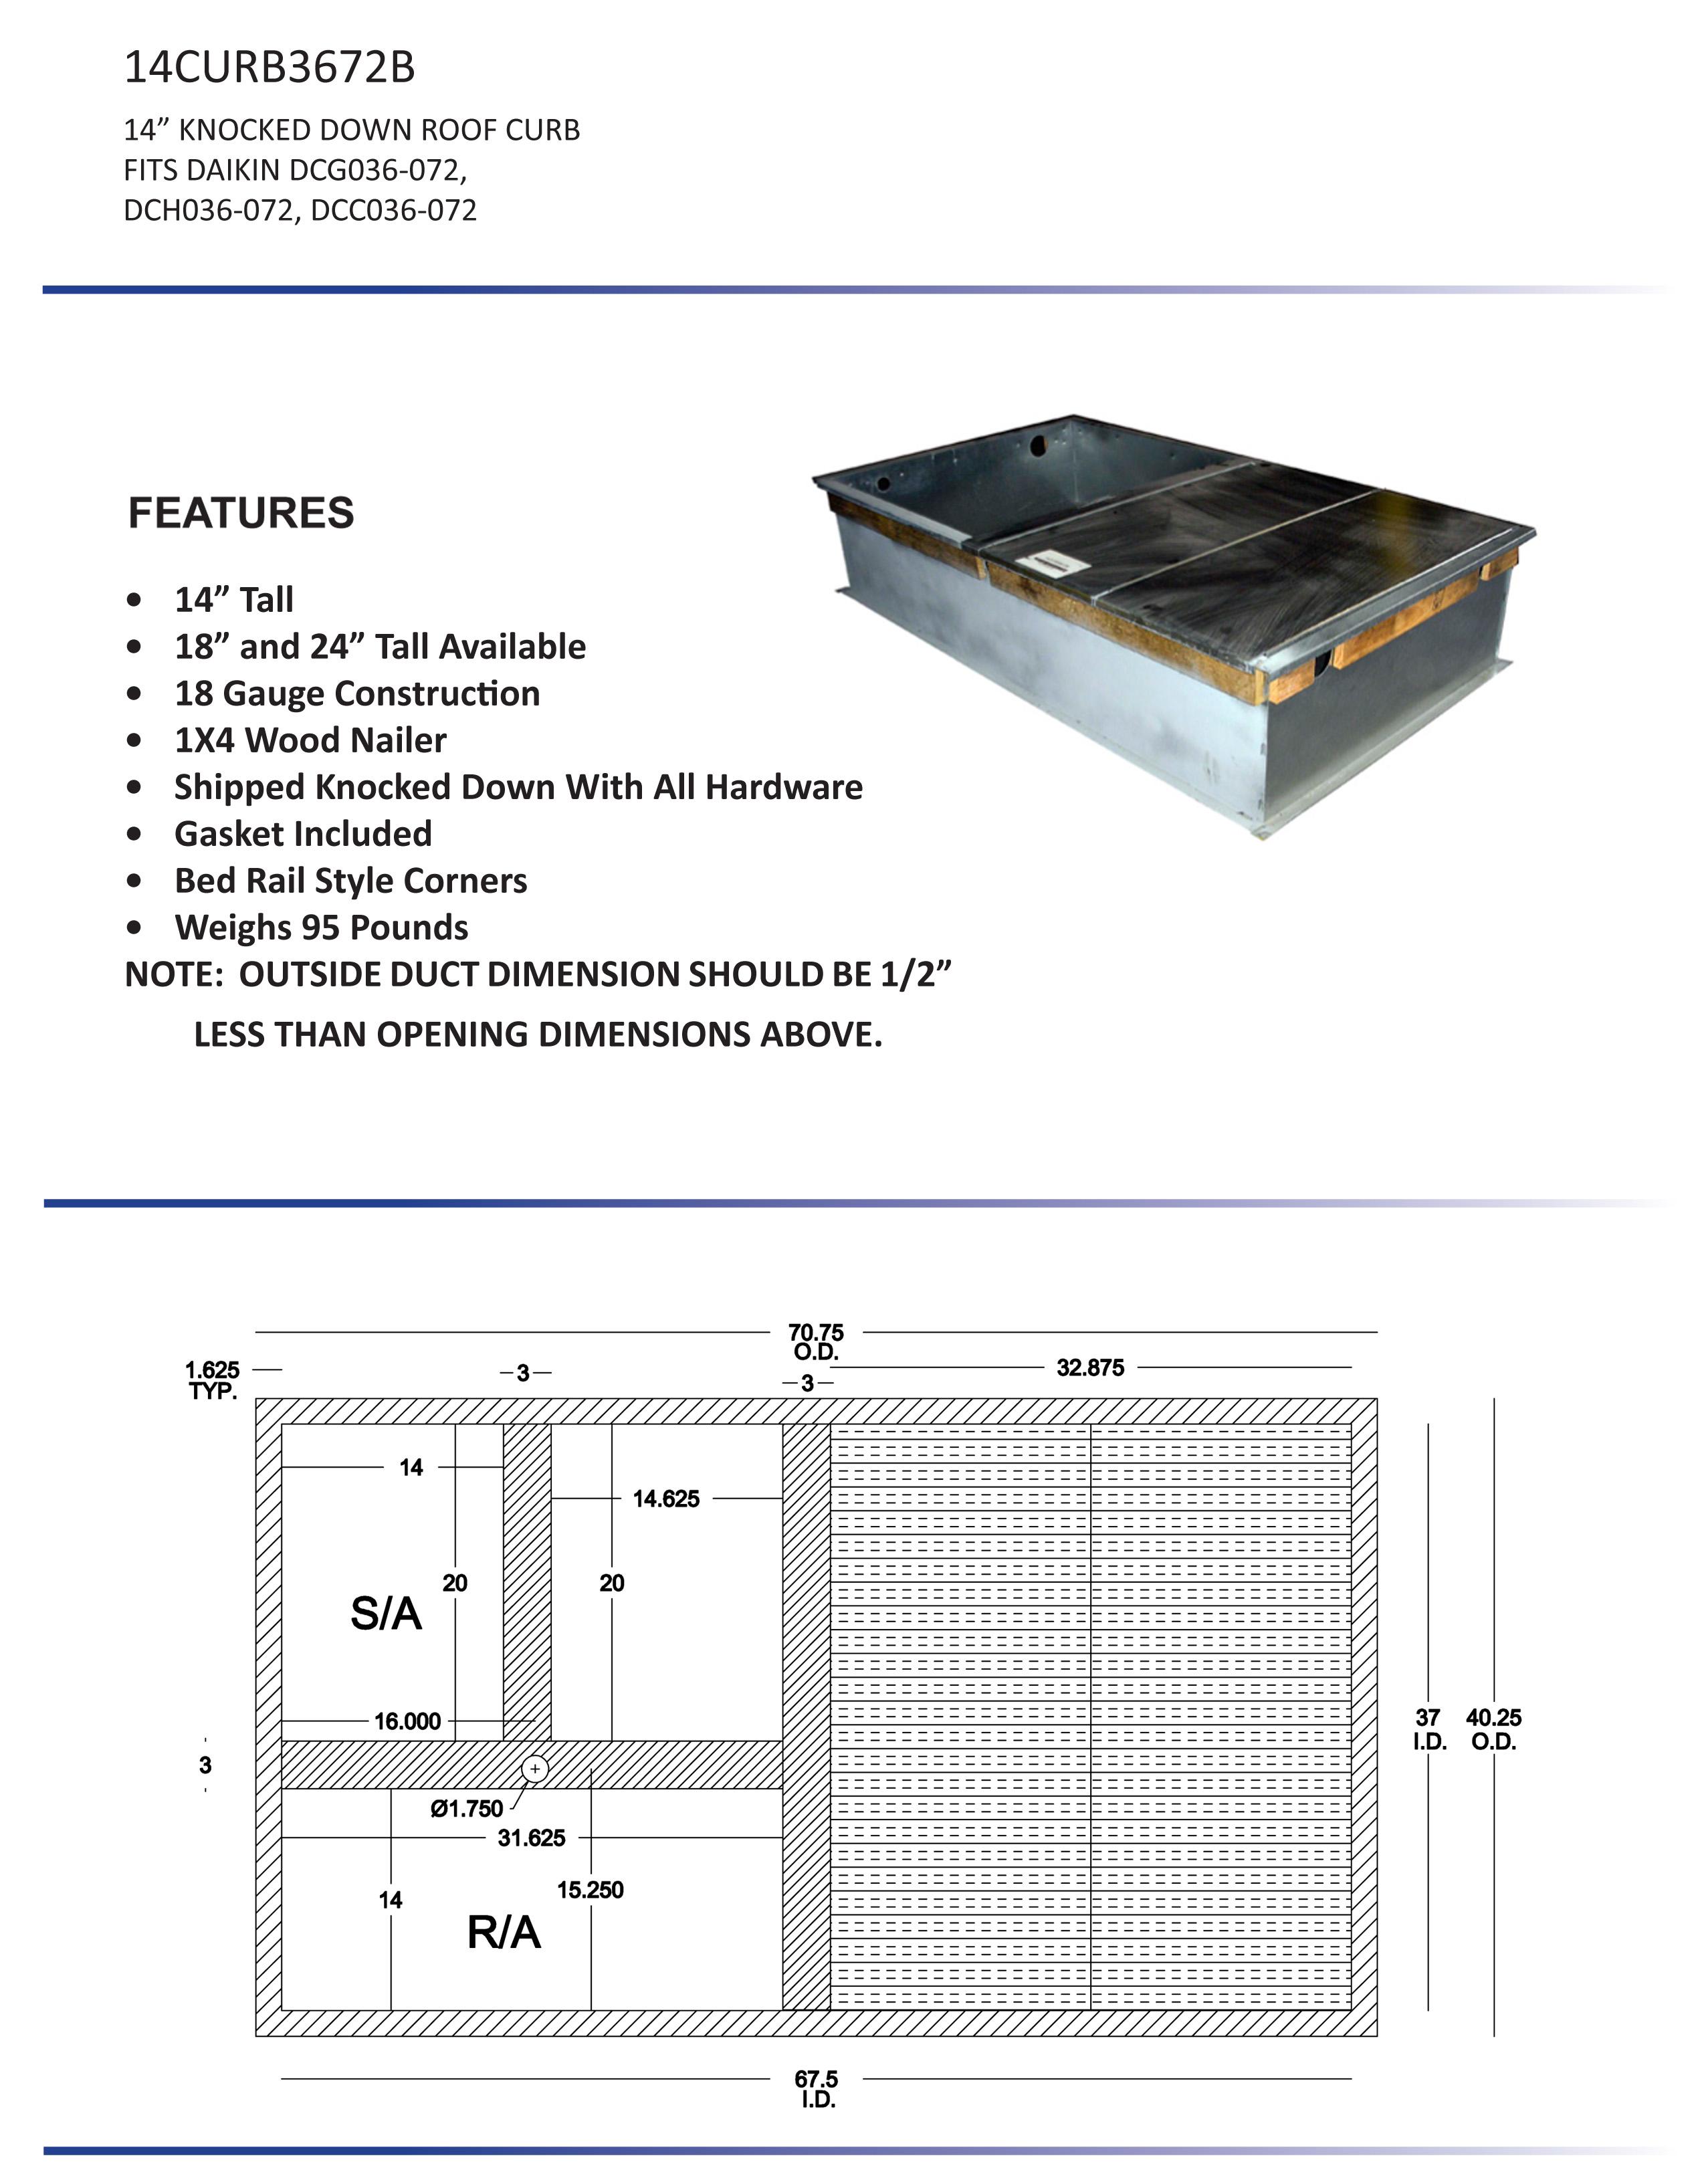 3 6 ton daikin 14 roof curb dcc dcg dch models 14curb3672b rh budgetheating com Window Air Conditioner Wiring Diagram Goodman Air Conditioner Wiring Diagram